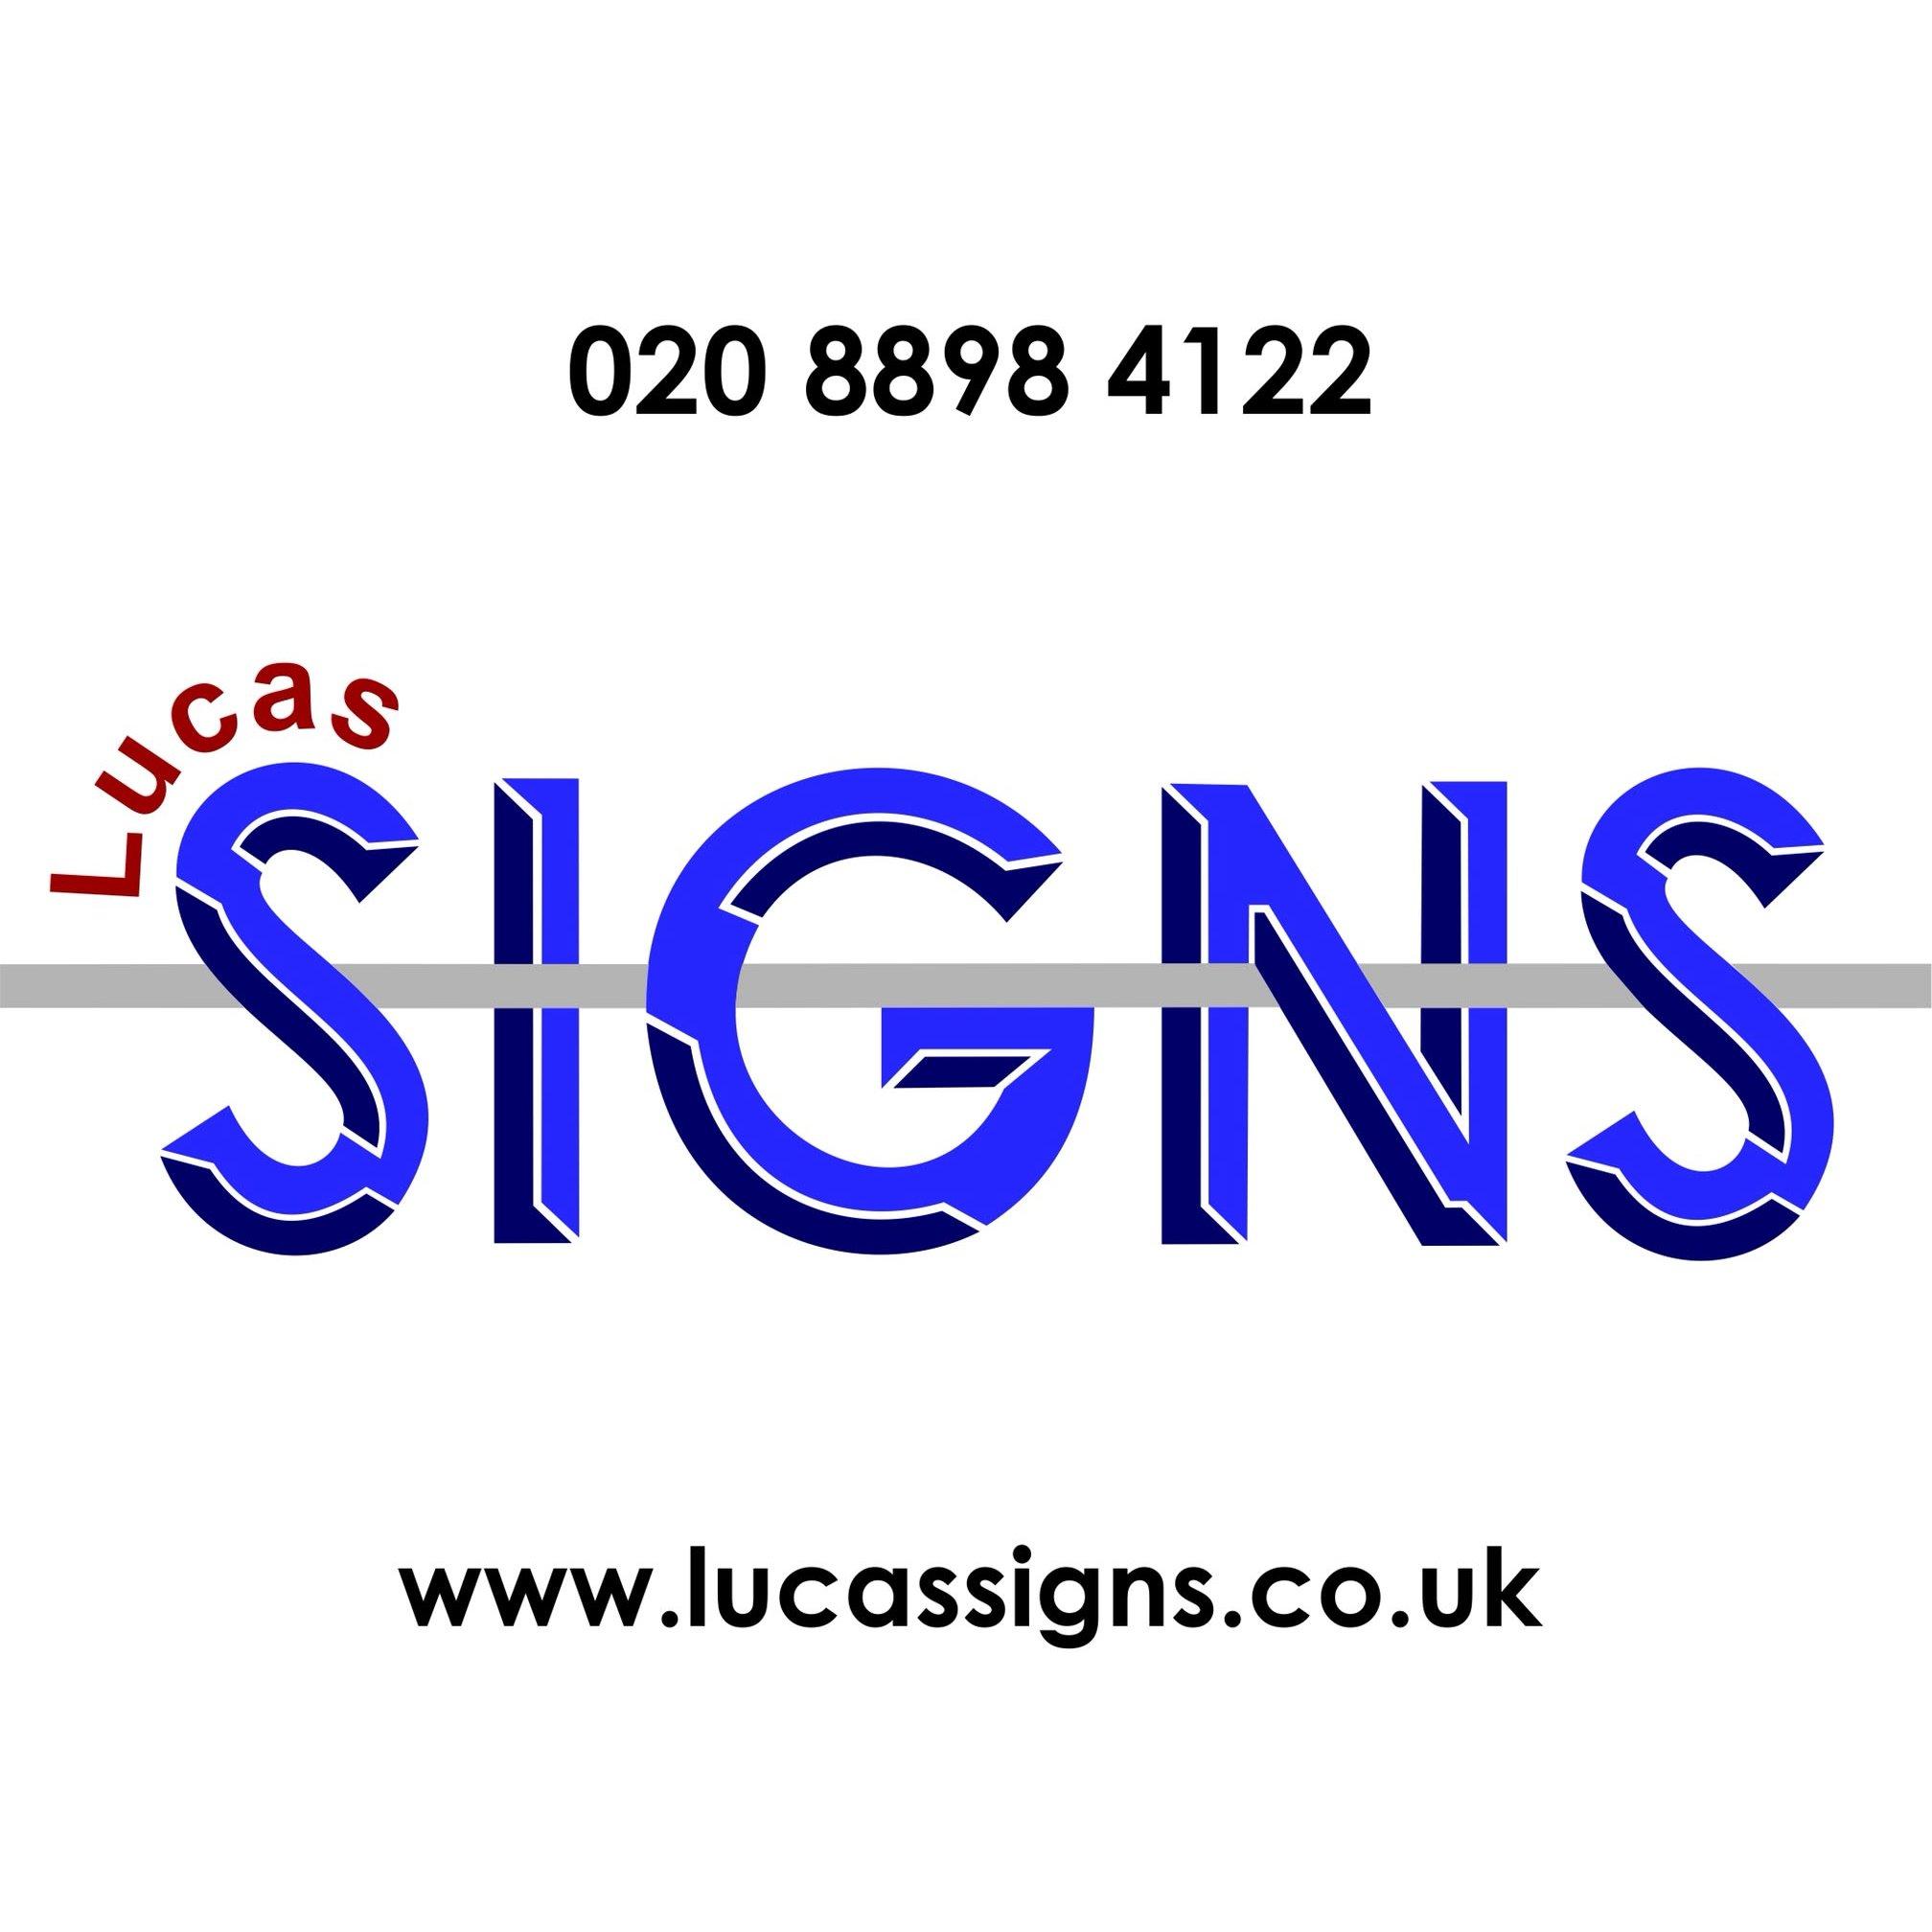 Lucas Signs - Feltham, London TW13 5HG - 020 8898 4122 | ShowMeLocal.com